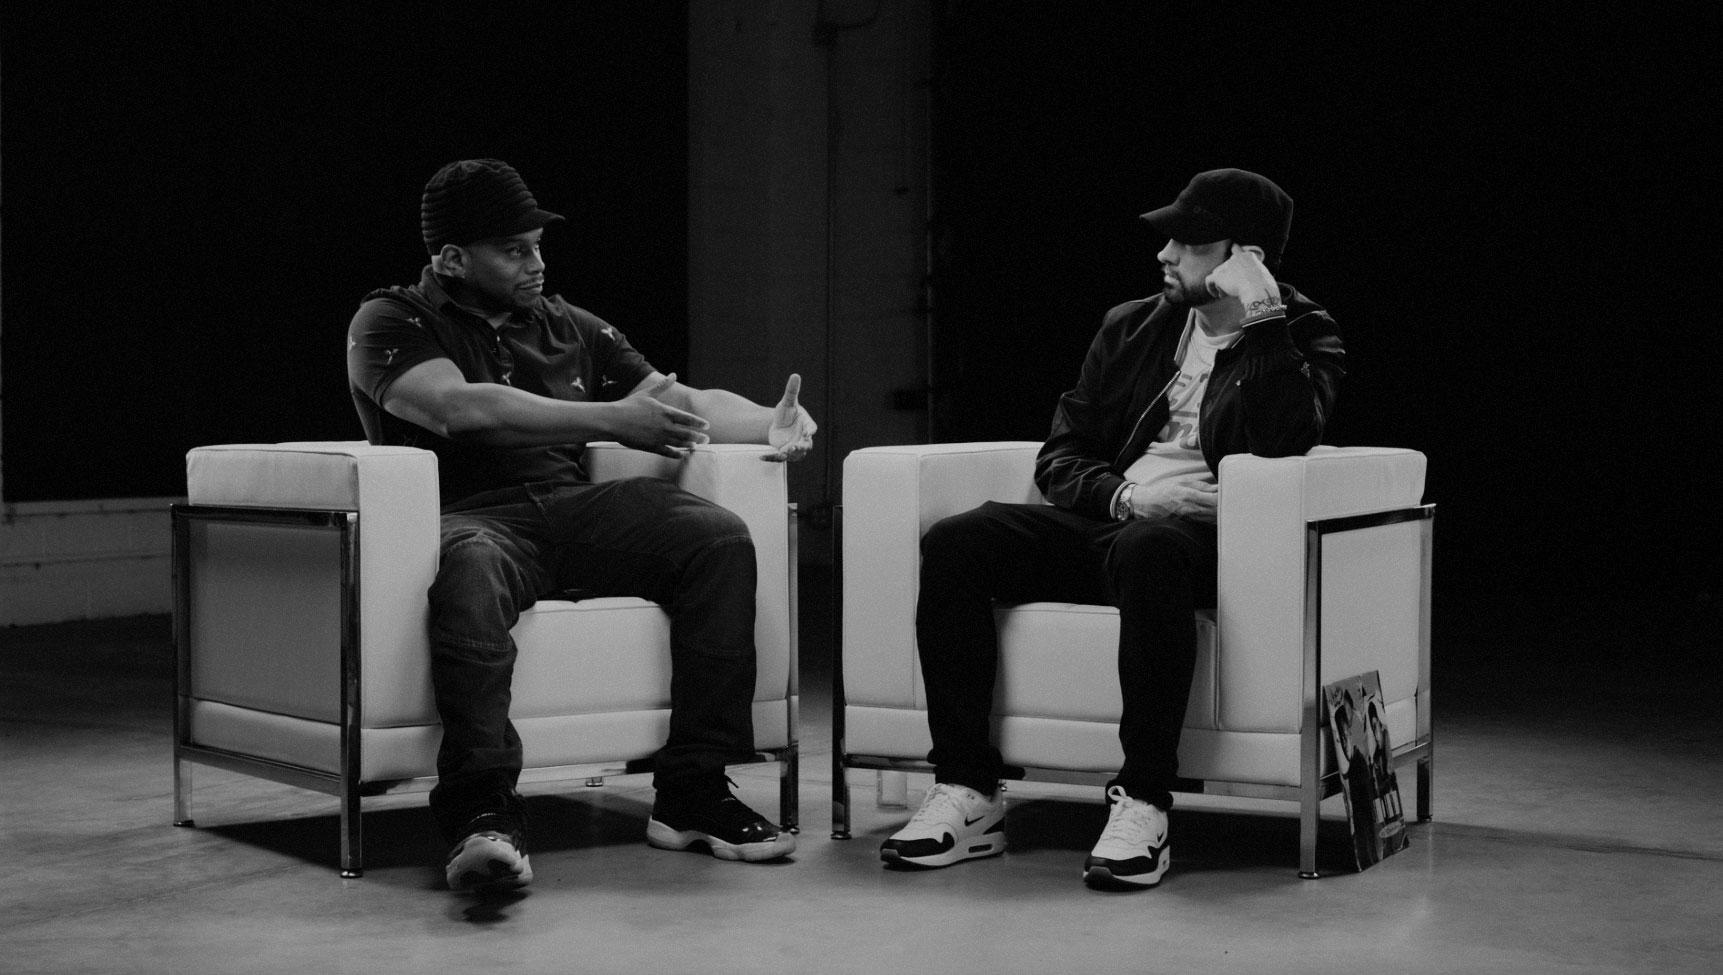 PART 1 LIVE NOW - THE #KAMIKAZE INTERVIEW @REALSWAY - https://t.co/v51QQVEDm8 https://t.co/04W3VZnFHL